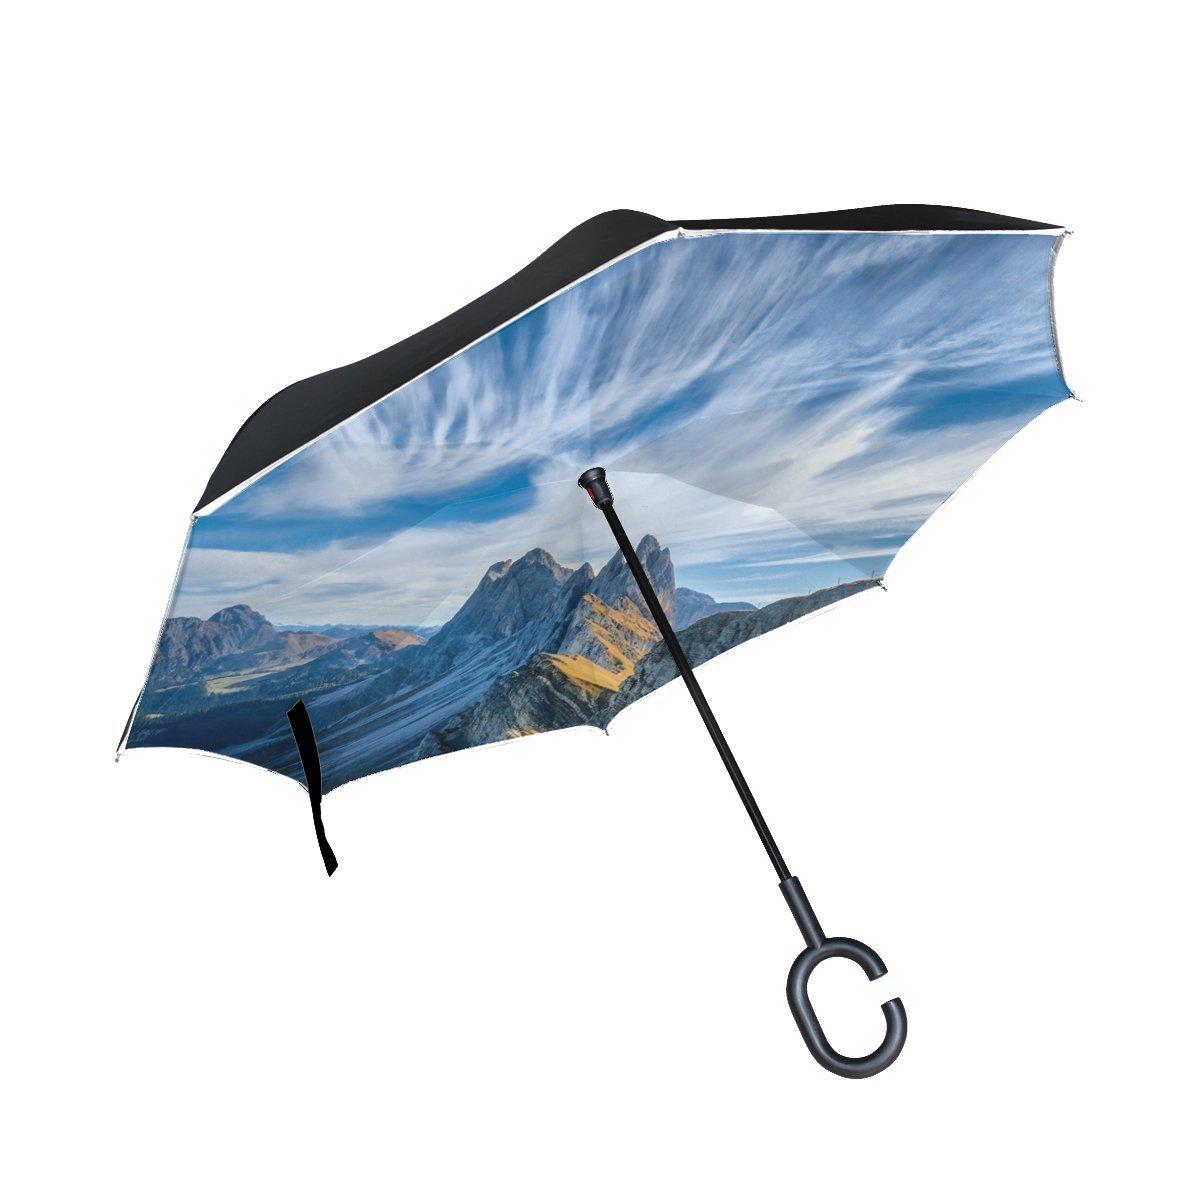 RH Studio Inverted Umbrella Italy Mountains Cliffs Large Double Layer Outdoor Rain Sun Car Reversible Umbrella